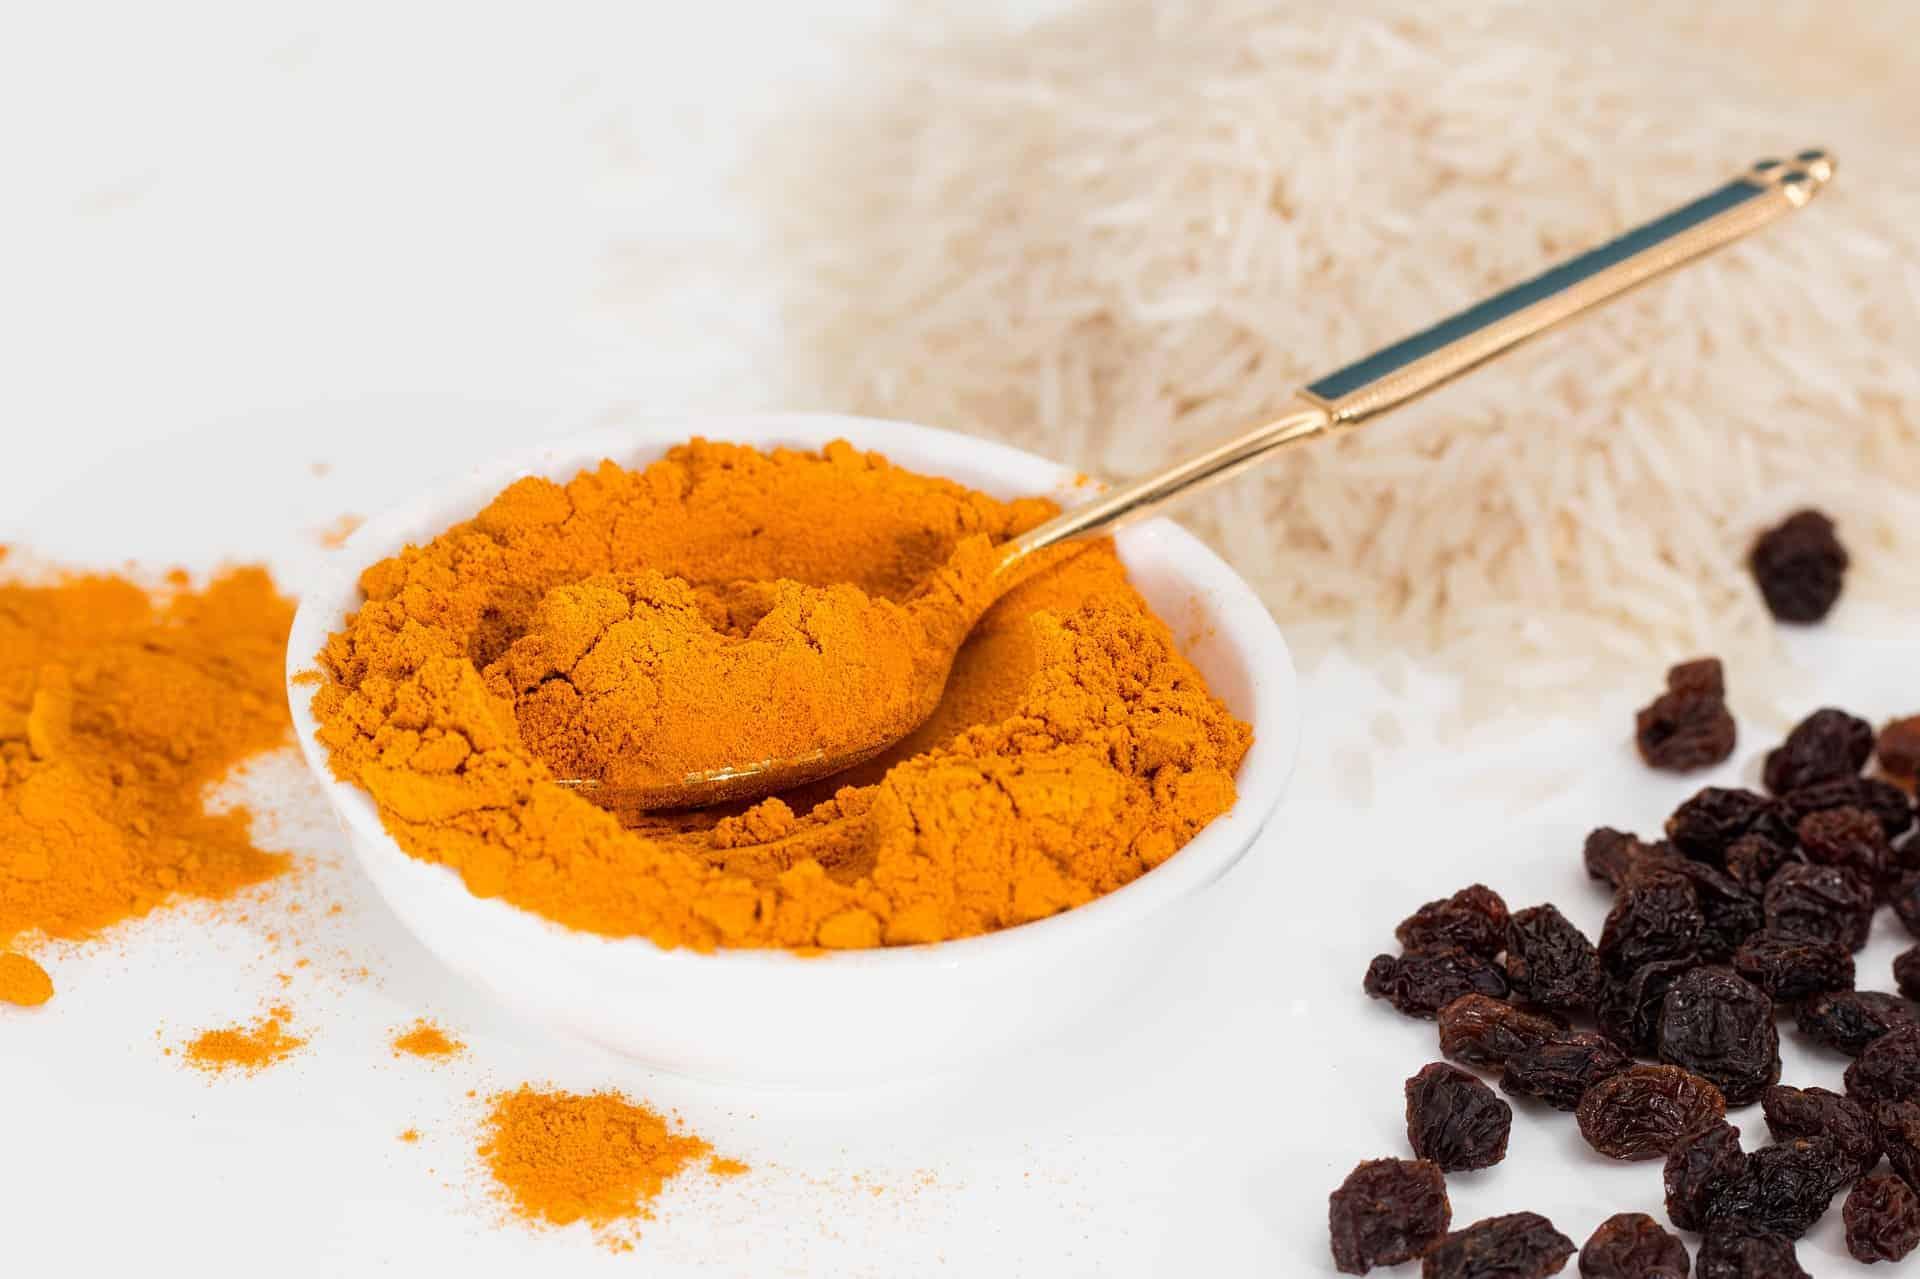 9 Health Benefits of Turmeric